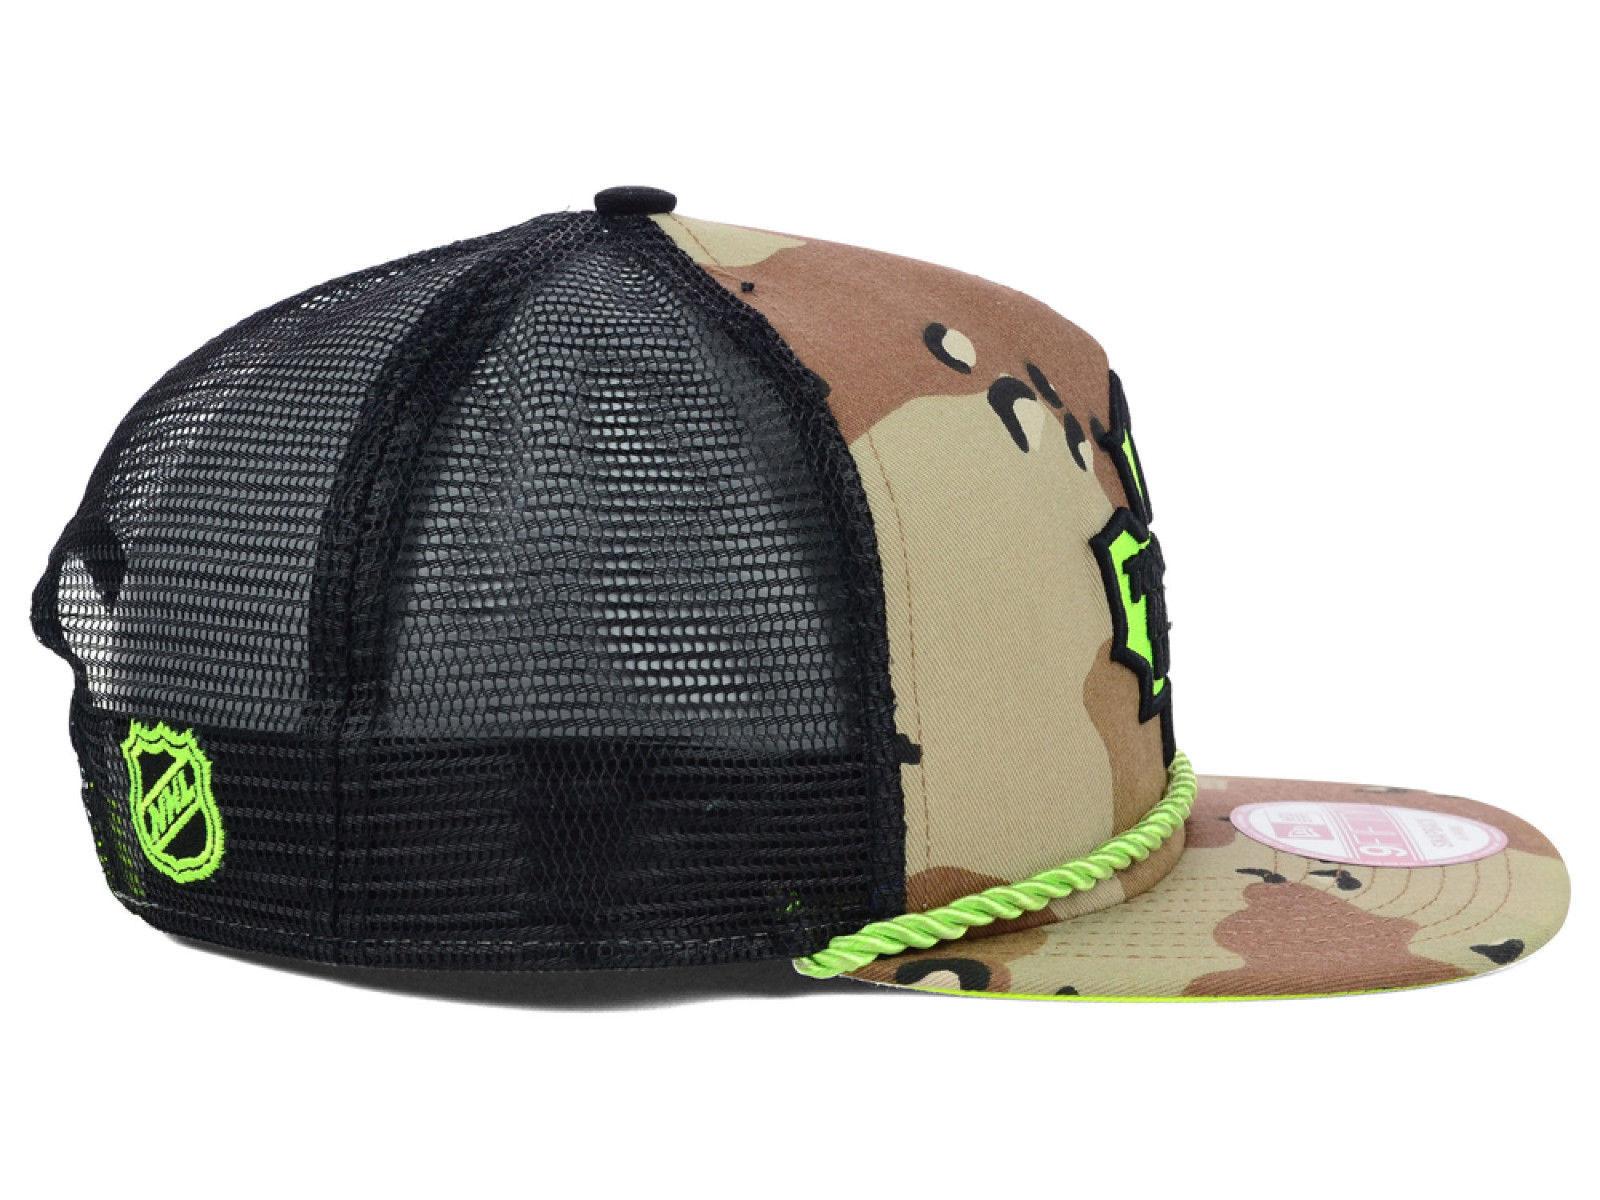 7eb4b333670d2 TORONTO MAPLE LEAFS Snapback Hat NHL Hockey New Era Rope Mesh Camo Neon Cap  NEW